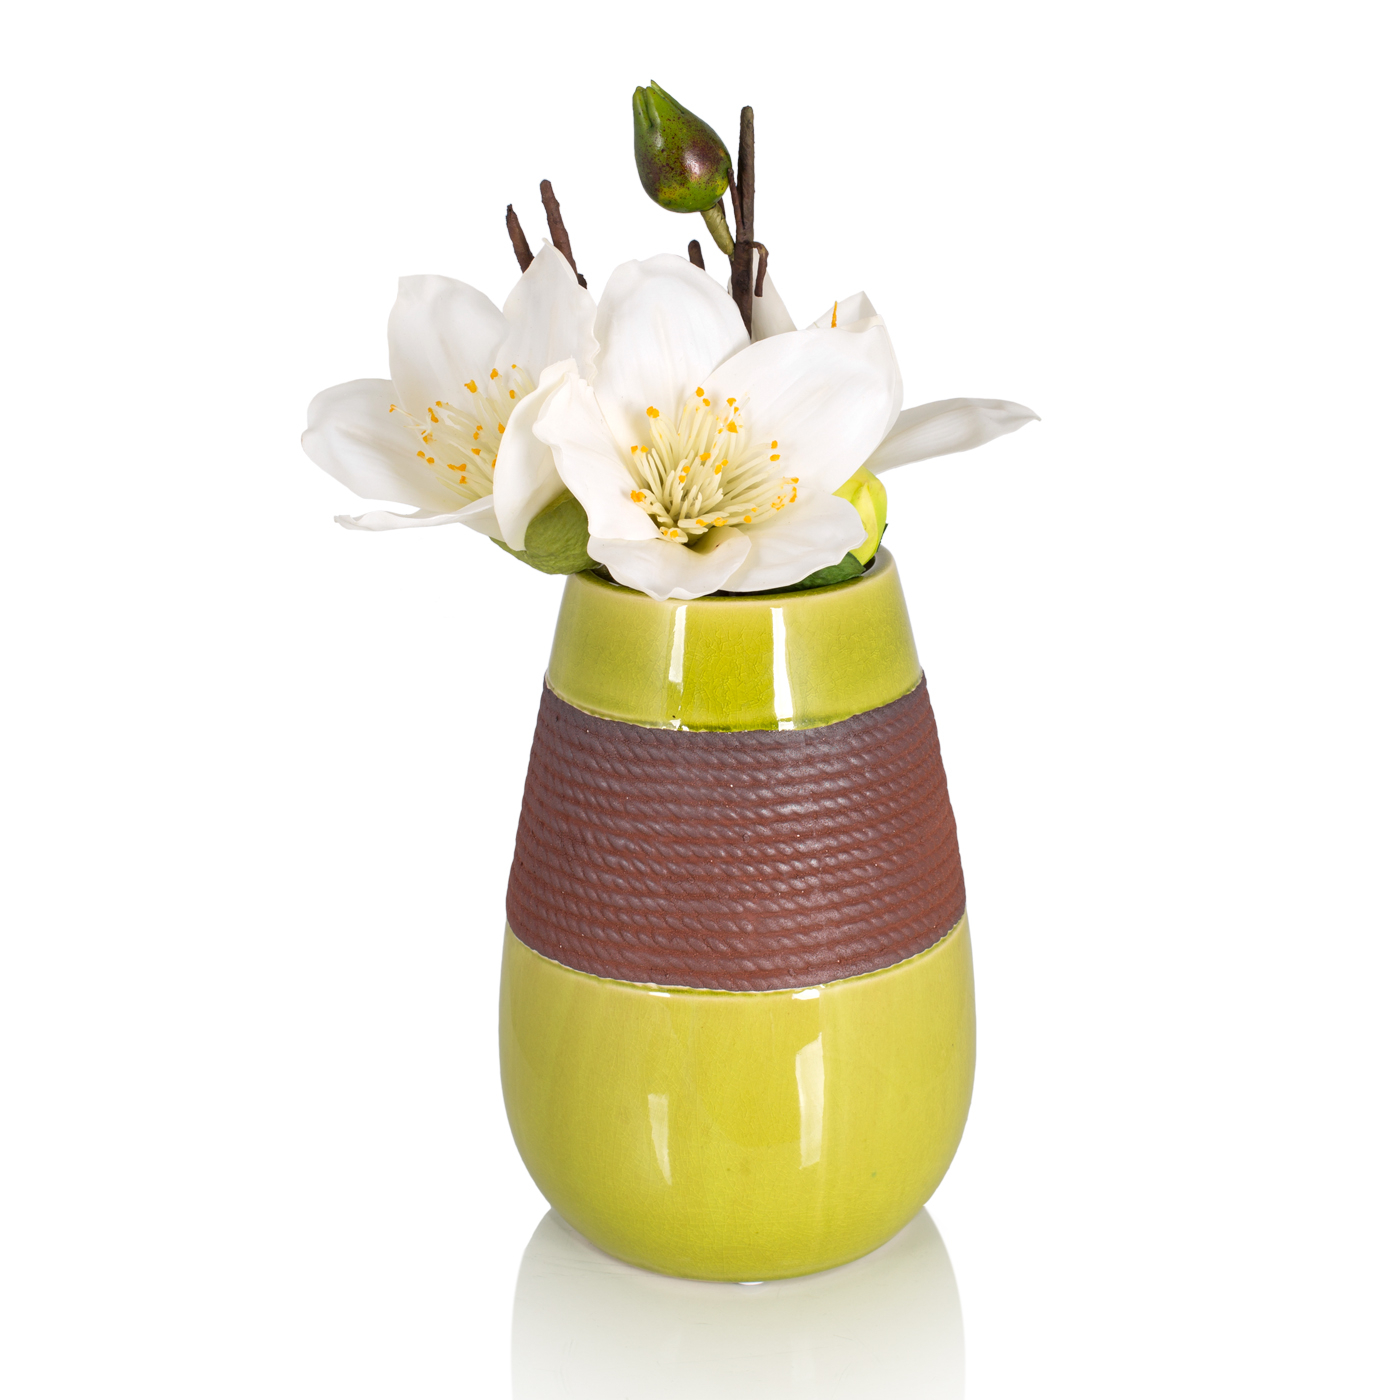 {} Home Philosophy Ваза Carima Цвет: Зелено-Коричневый (17х17х26 см) ваза кружева цветов 26 см